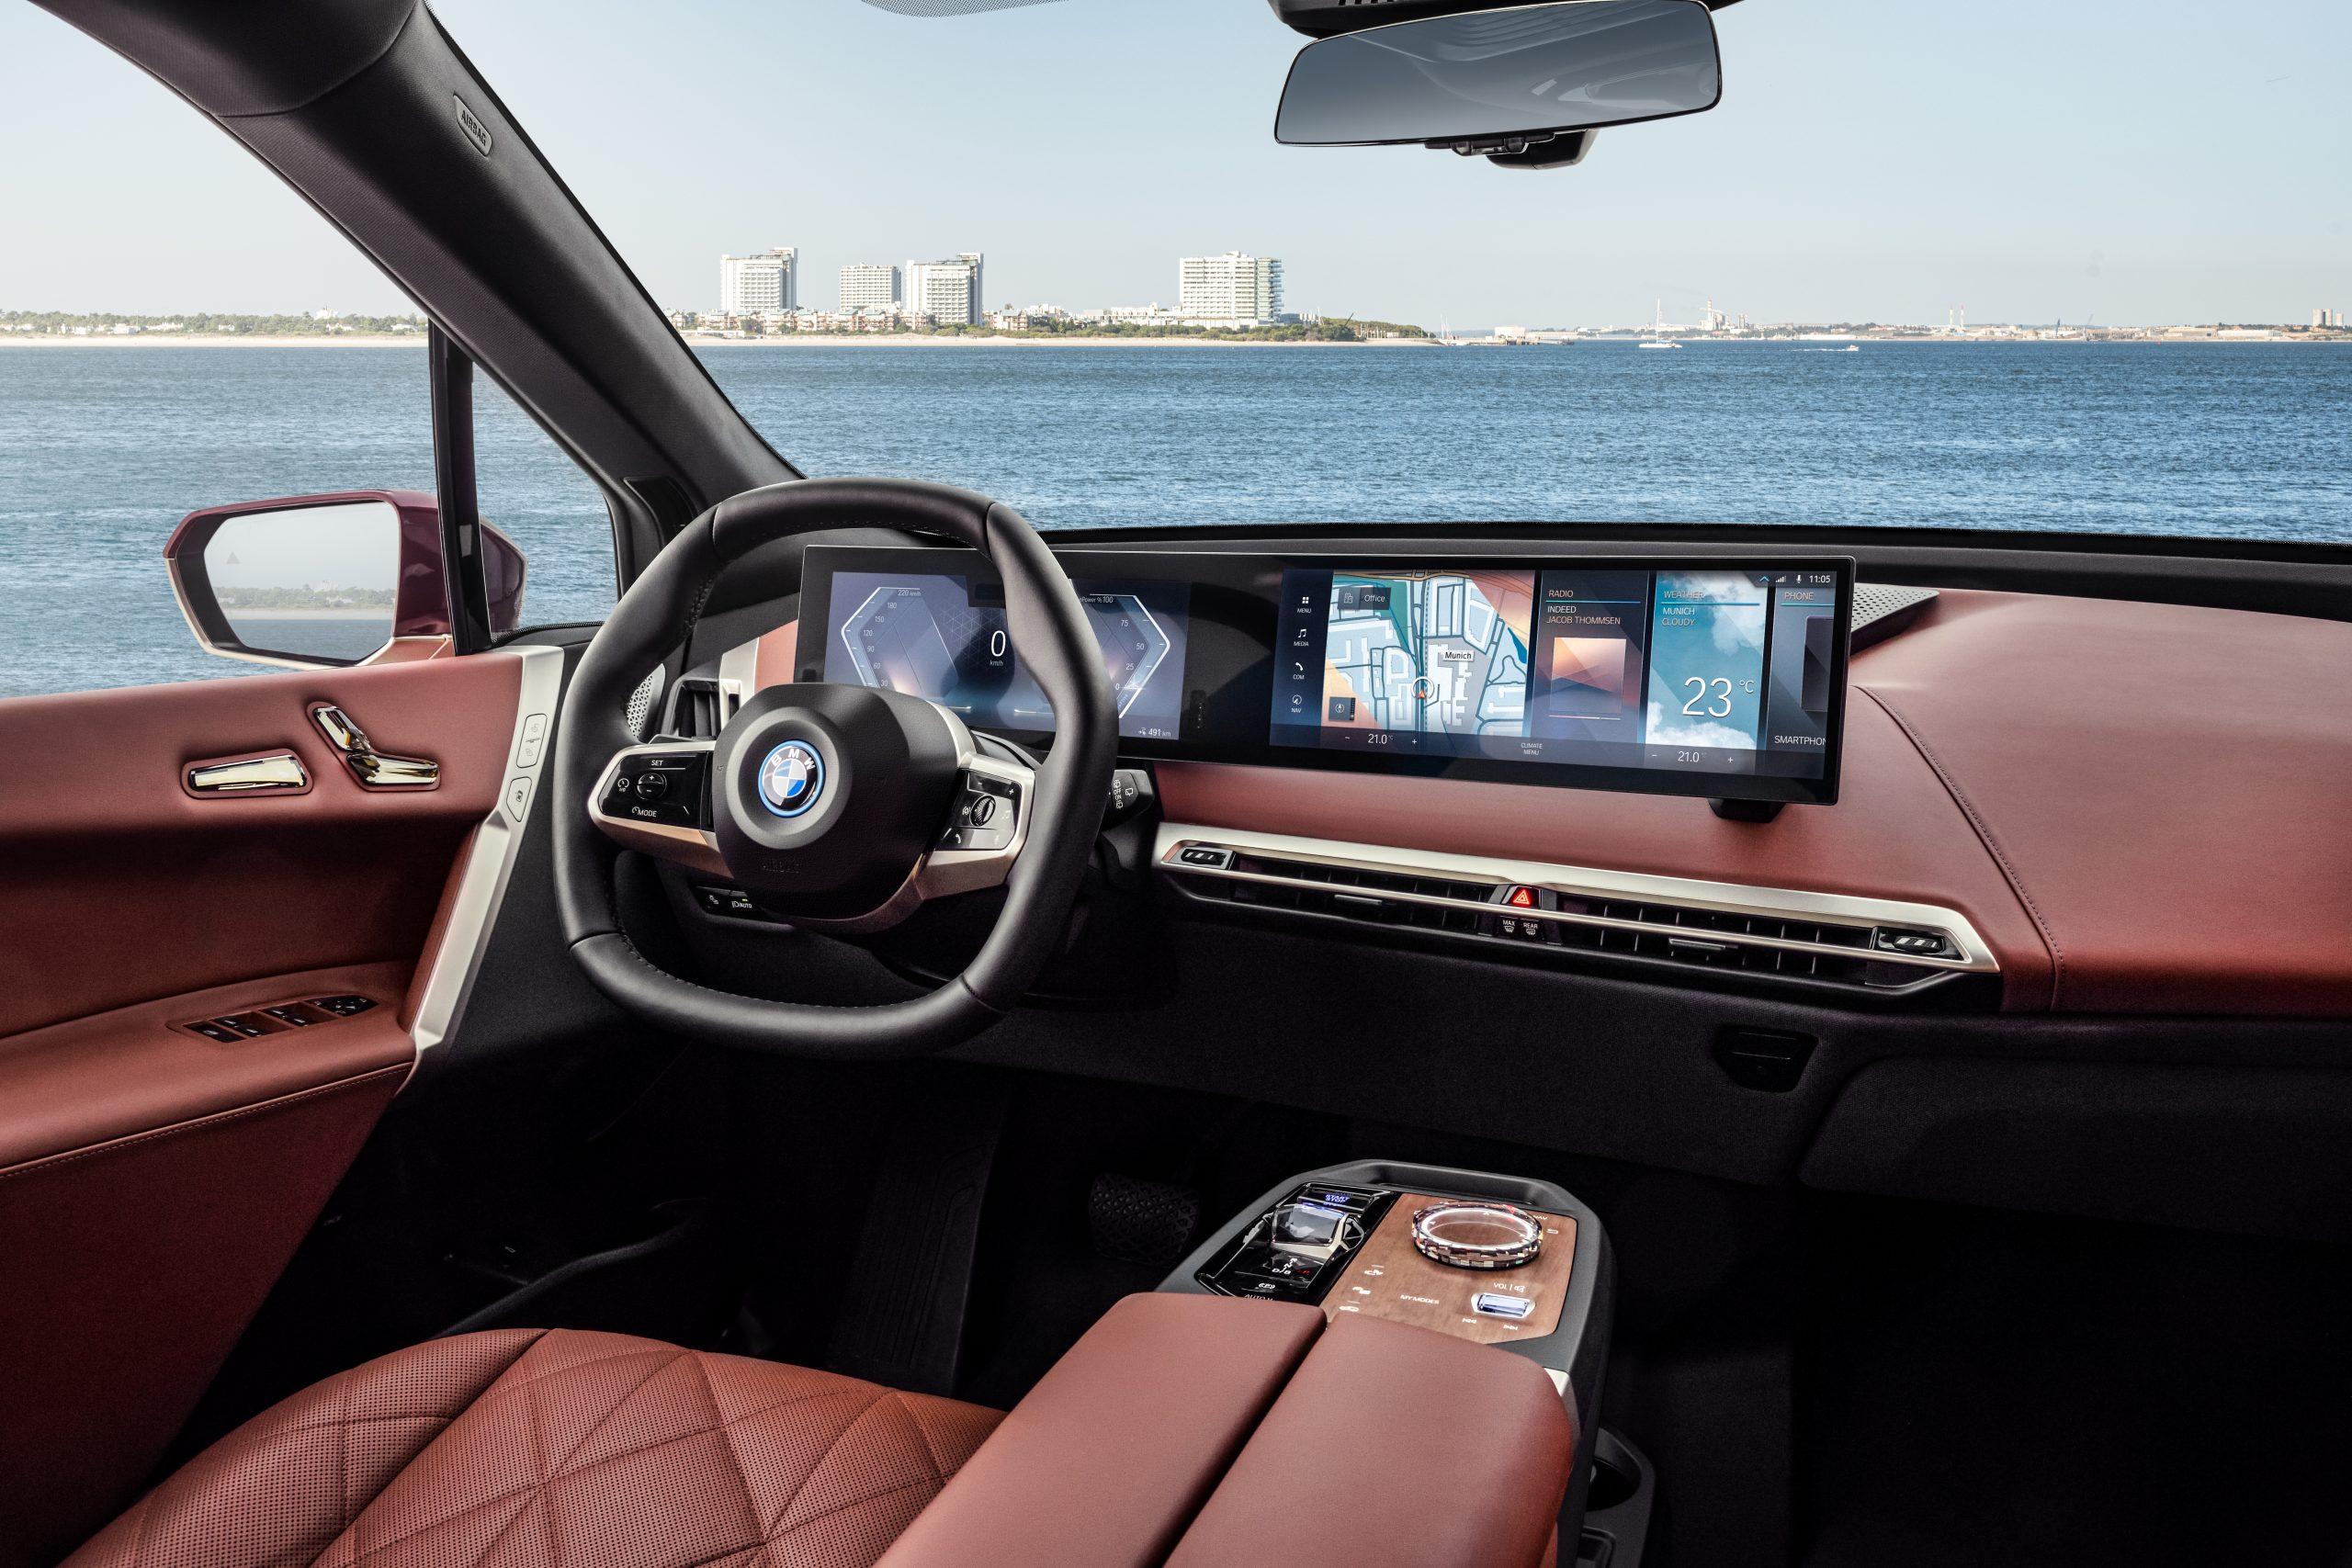 BMW iDrive 8 iX interior